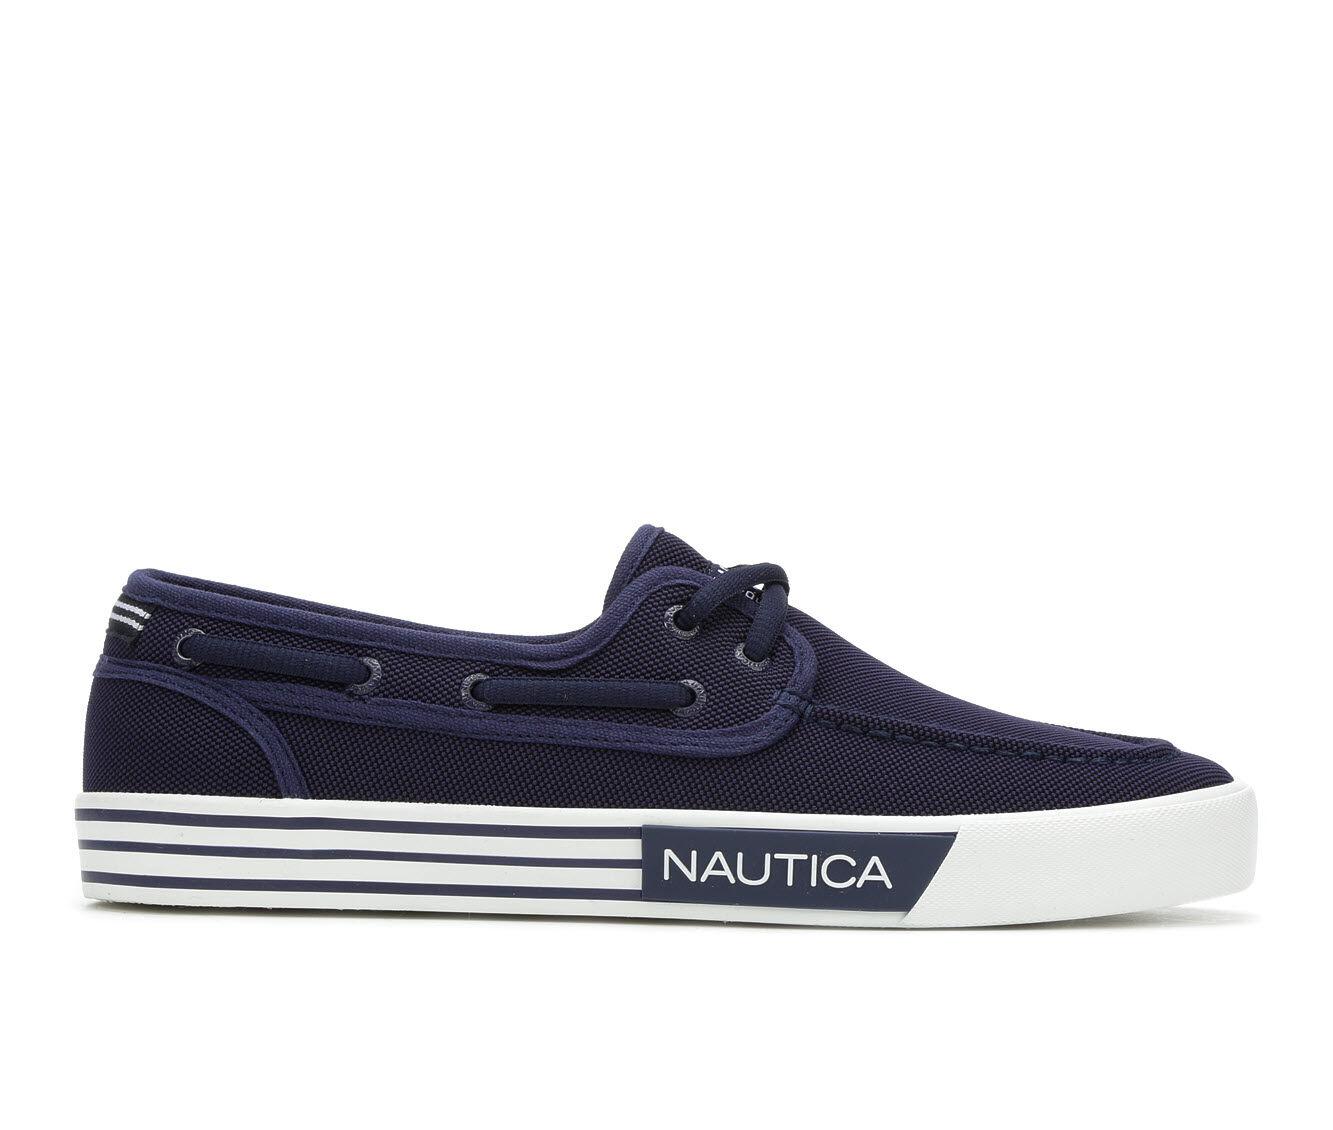 Men's Nautica Spinnaker Boat Shoes